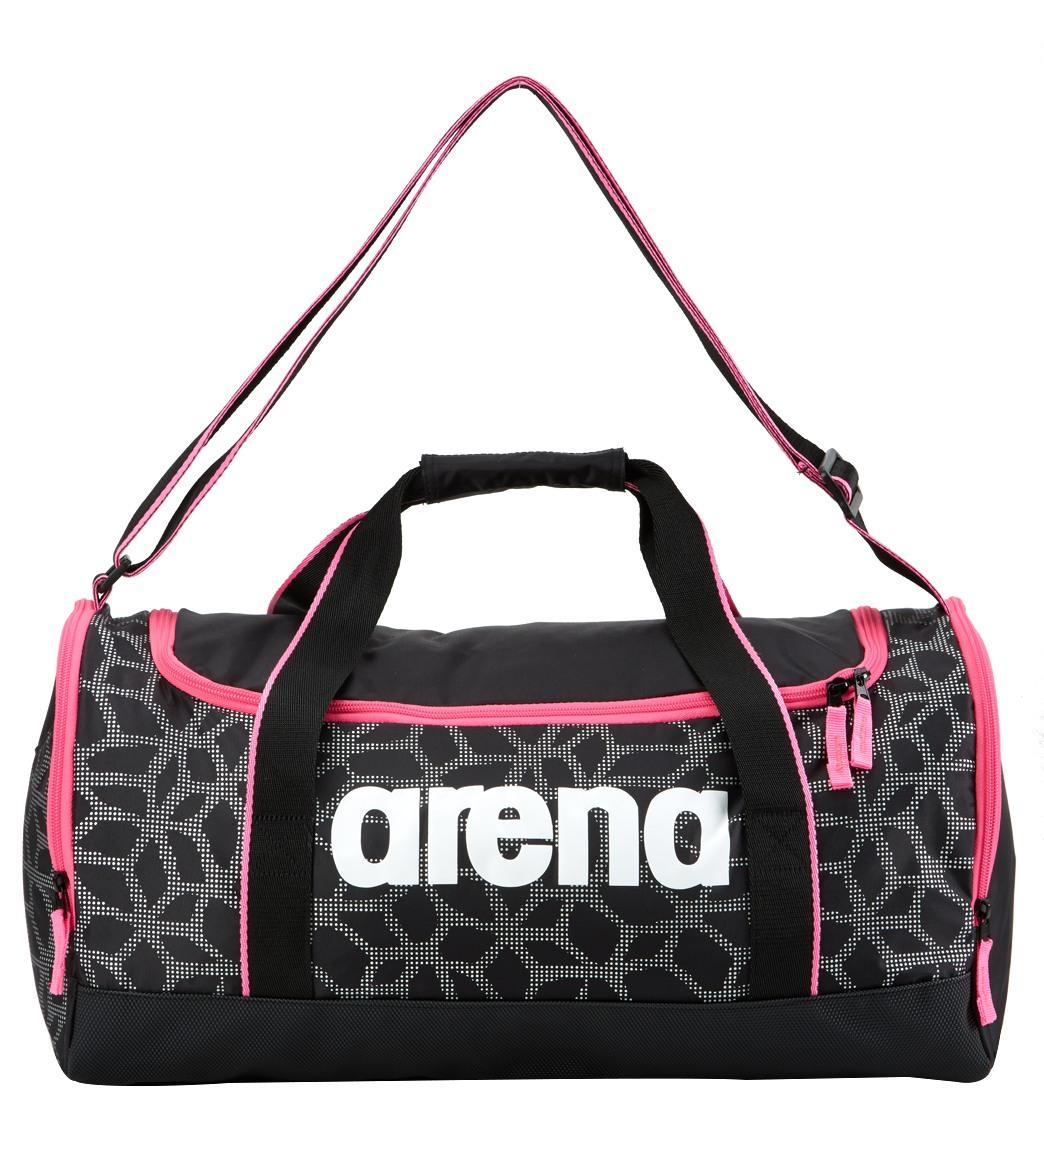 cc201c6075 Arena Spiky 2 X-Pivot Printed Medium Duffle Bag at SwimOutlet.com